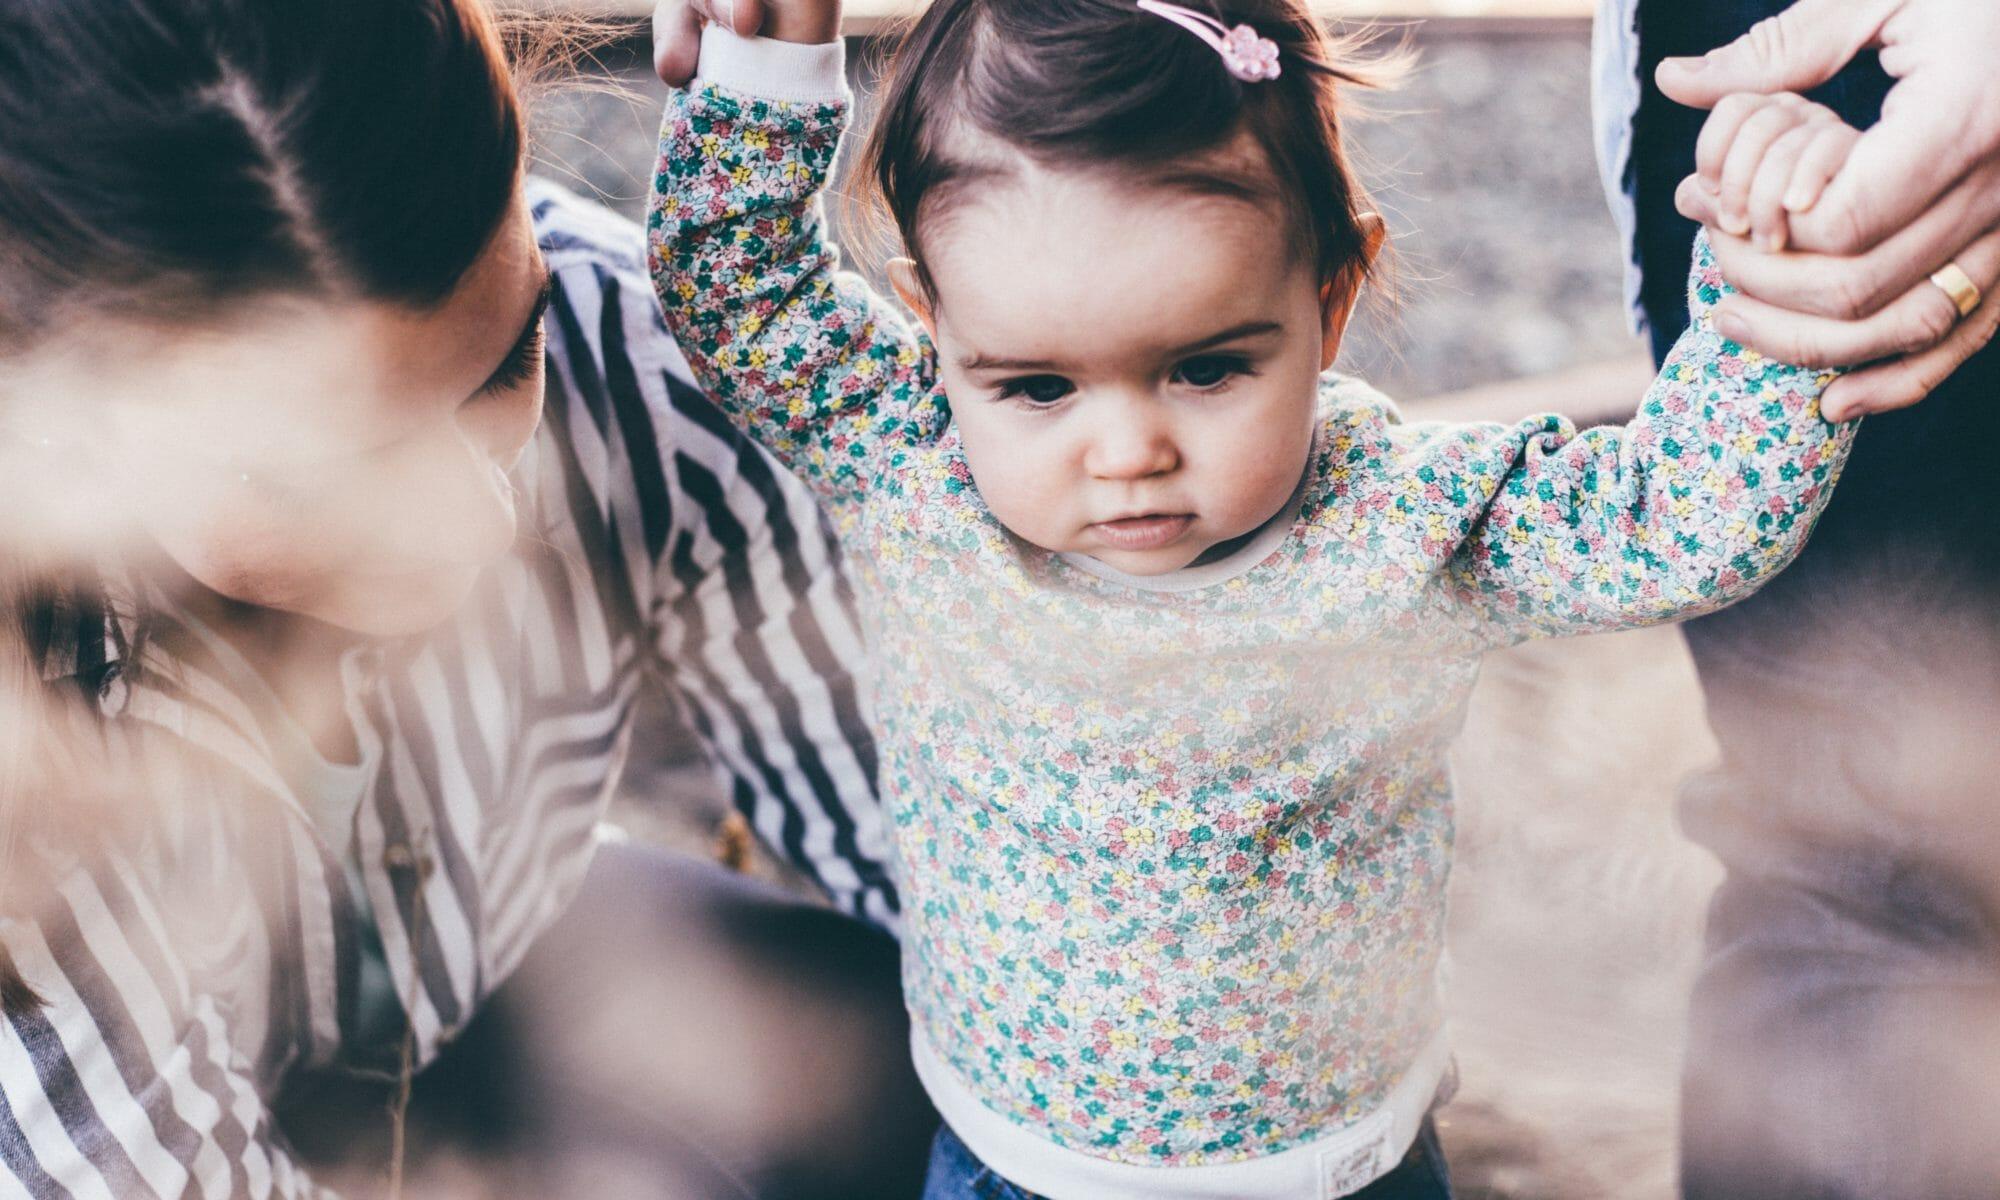 parenting skills - 2houses